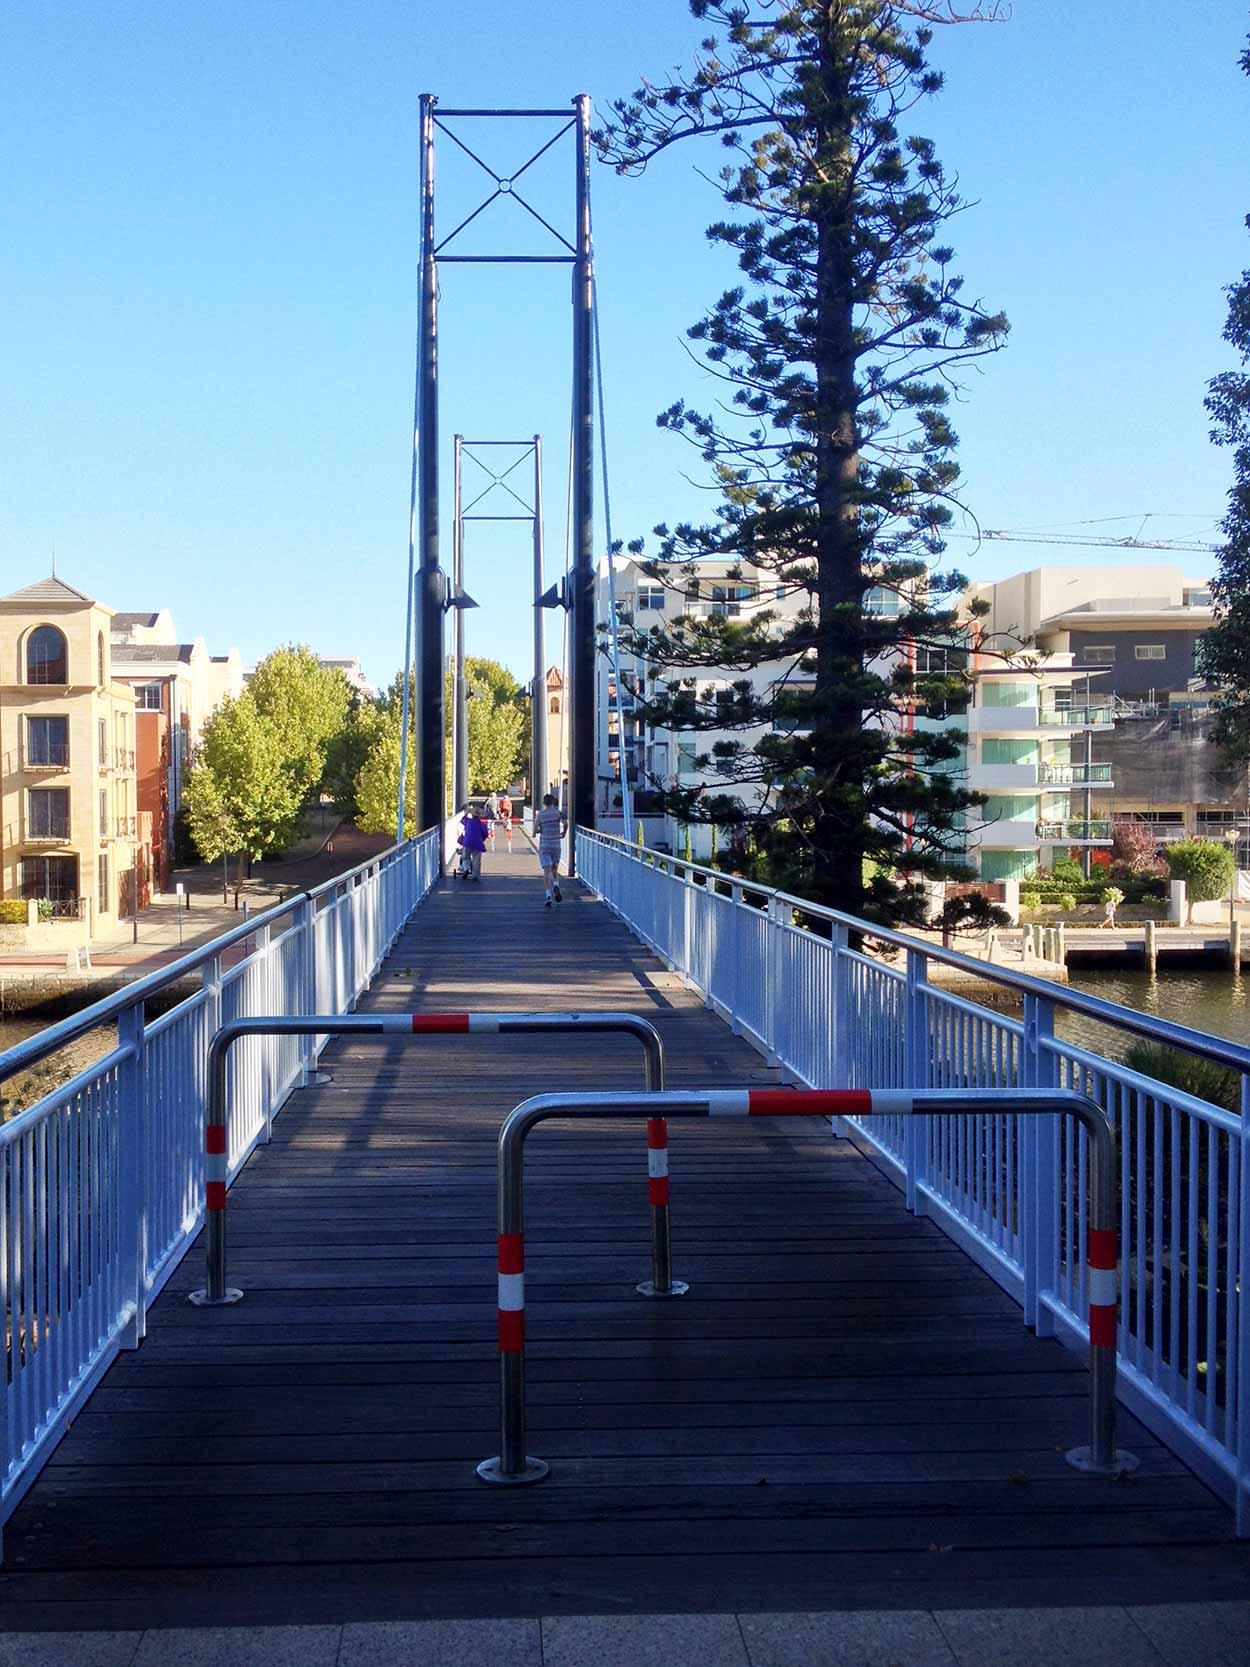 Trafalger Bridge over Claisebrook Cove, Perth, Western Australia